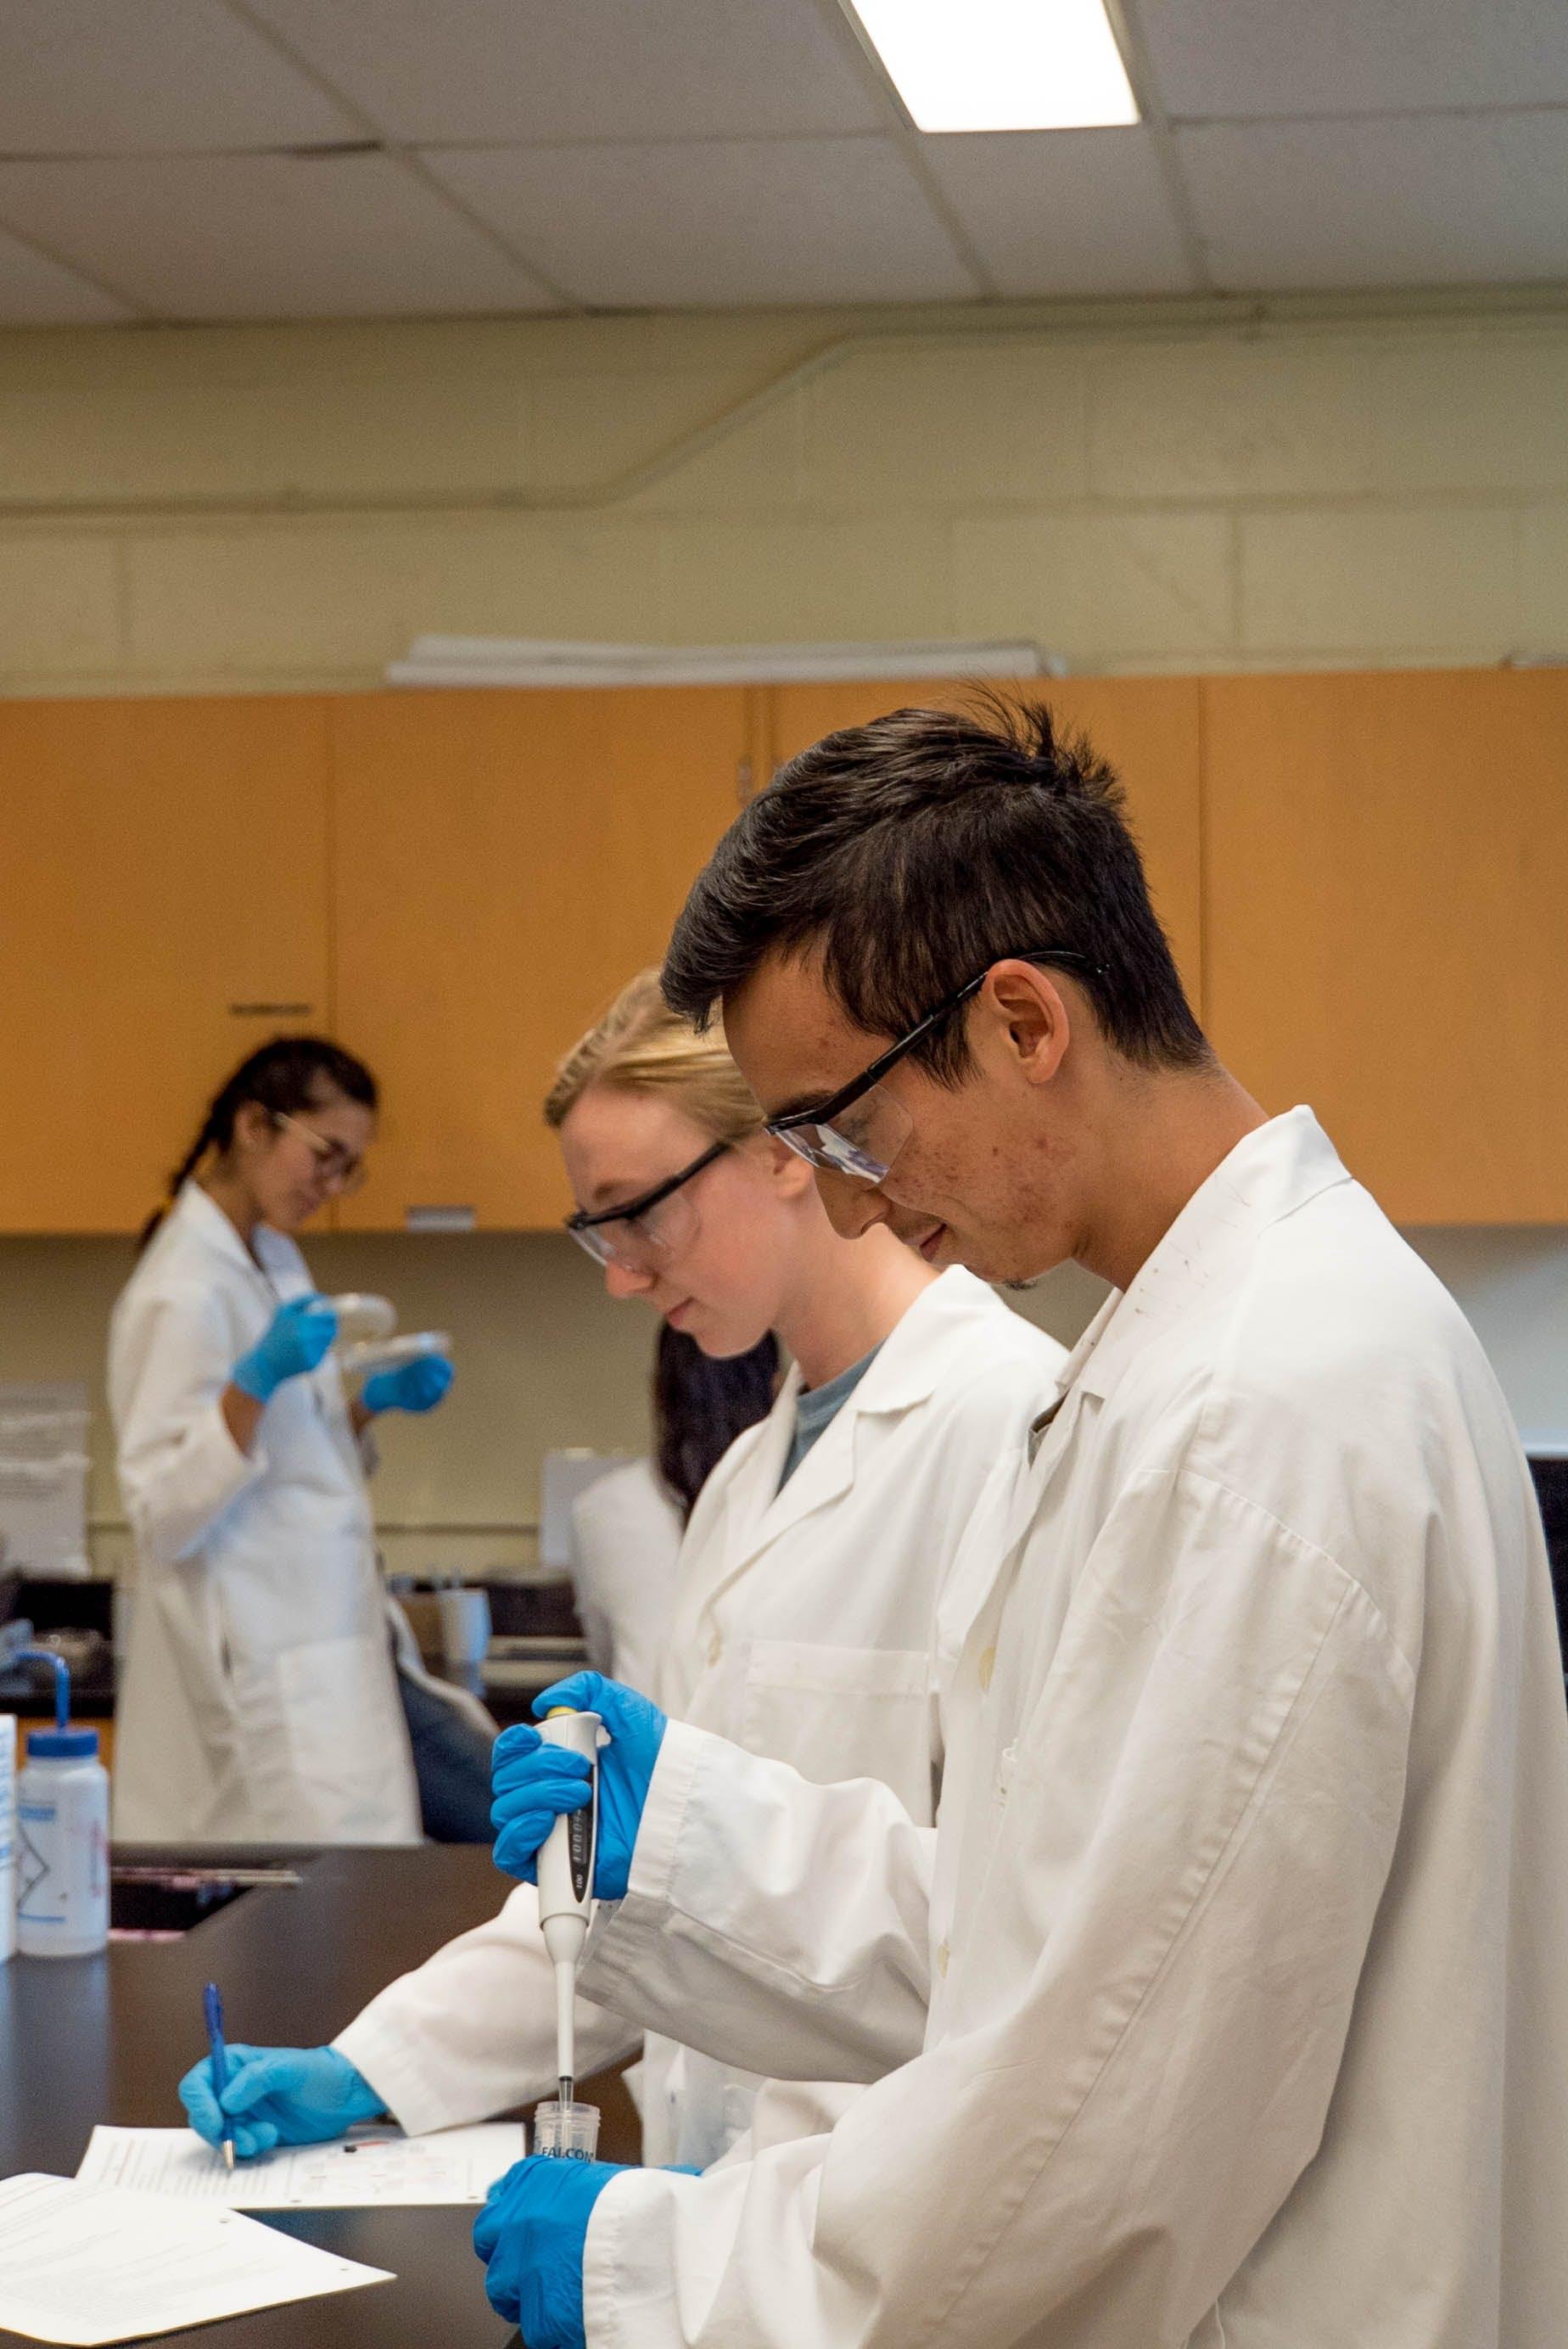 scientist doing science lab coat gloves beaker data